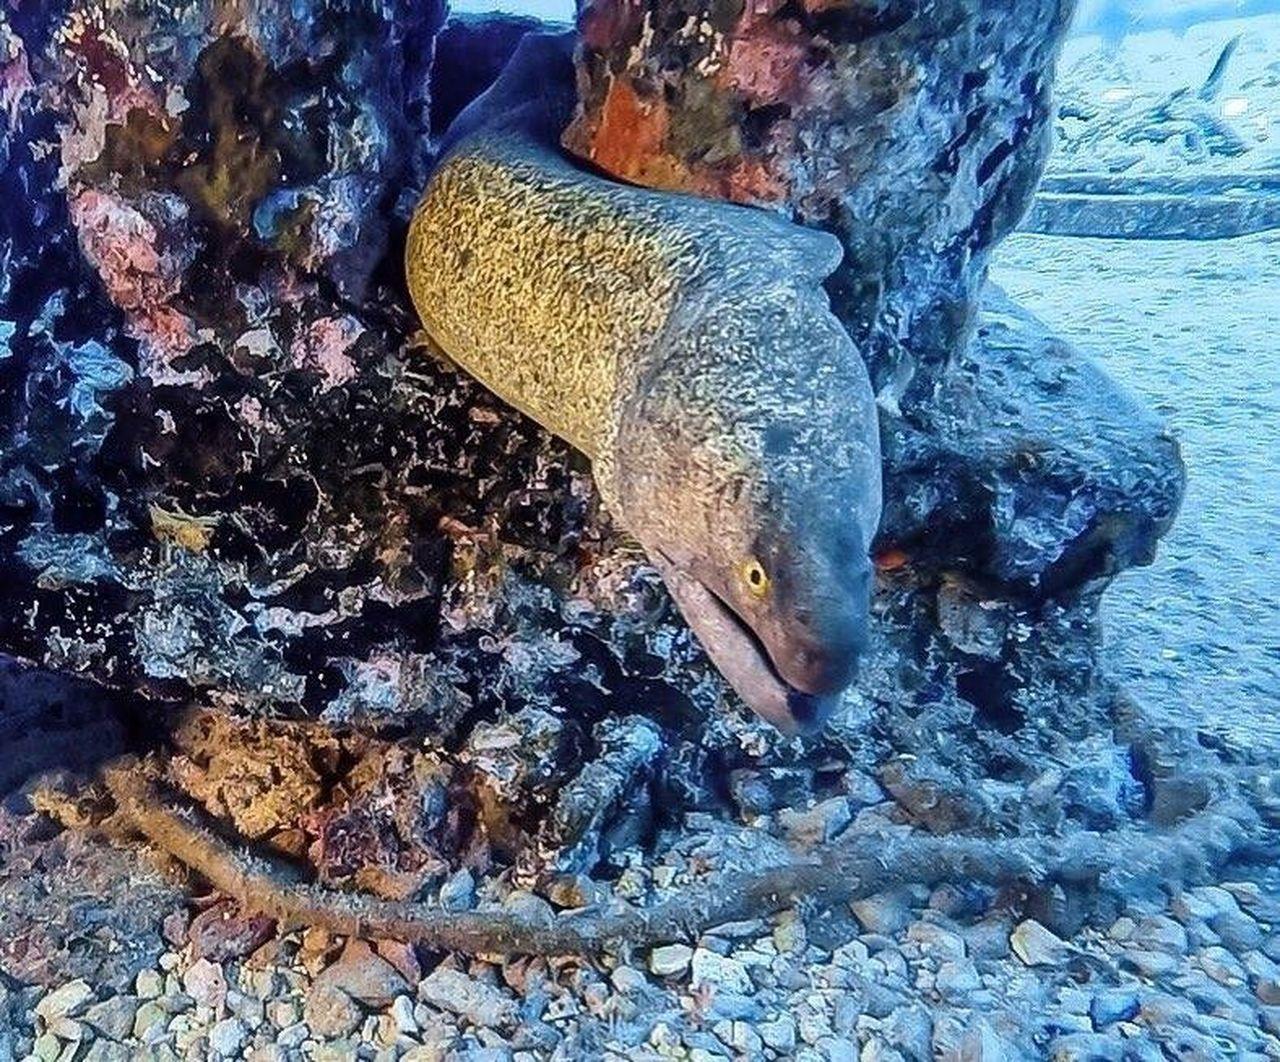 Eel Underwater Underwater Photography Sea Life Living Life Padi SCUBA Scuba Diving Nature Adventure Underthesea Oahu Pacific Ocean